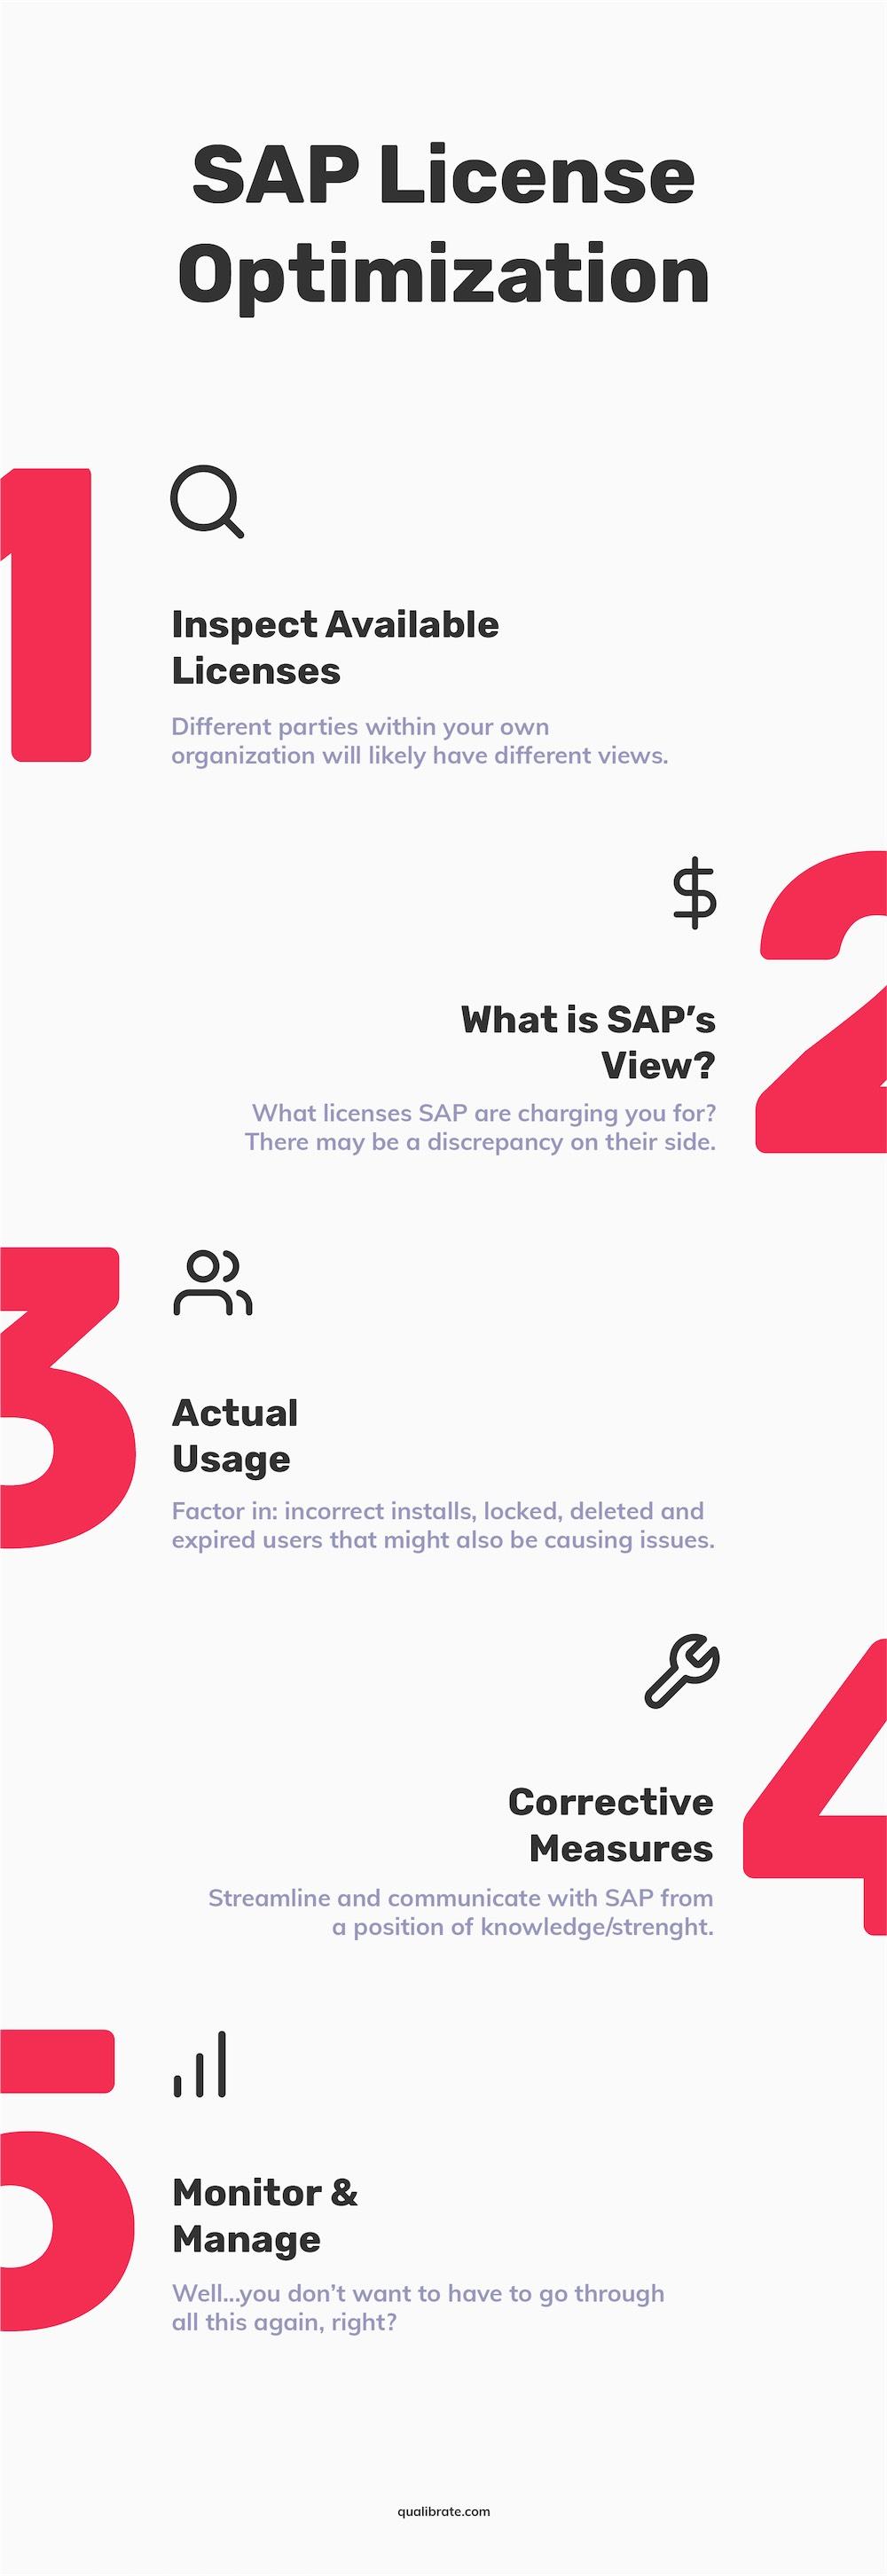 SAP license optimization